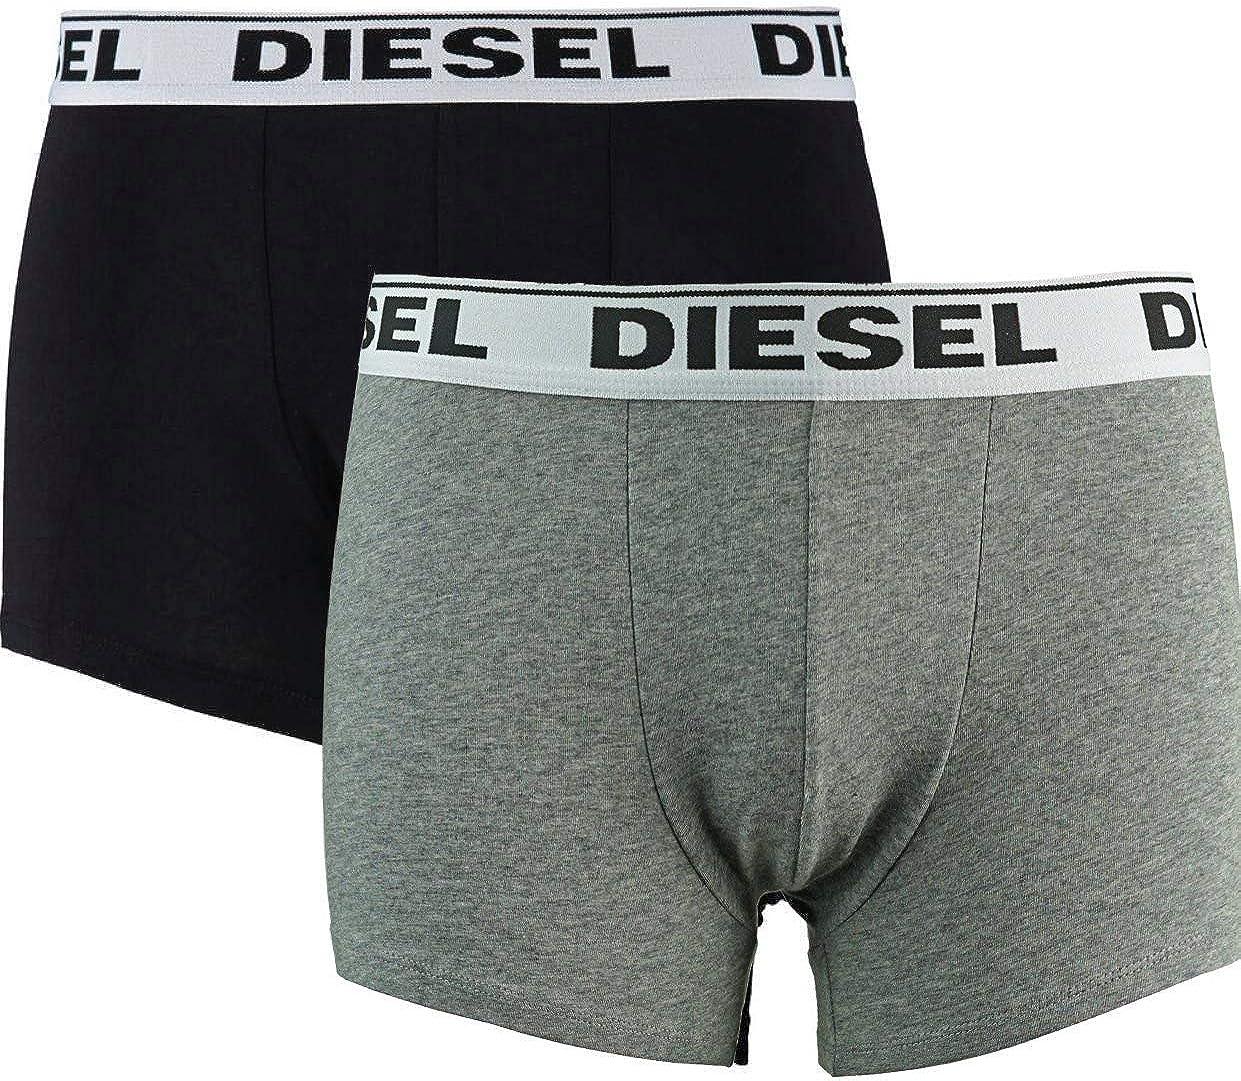 Diesel Men's Boxer Trunk 2 Pack Underwear